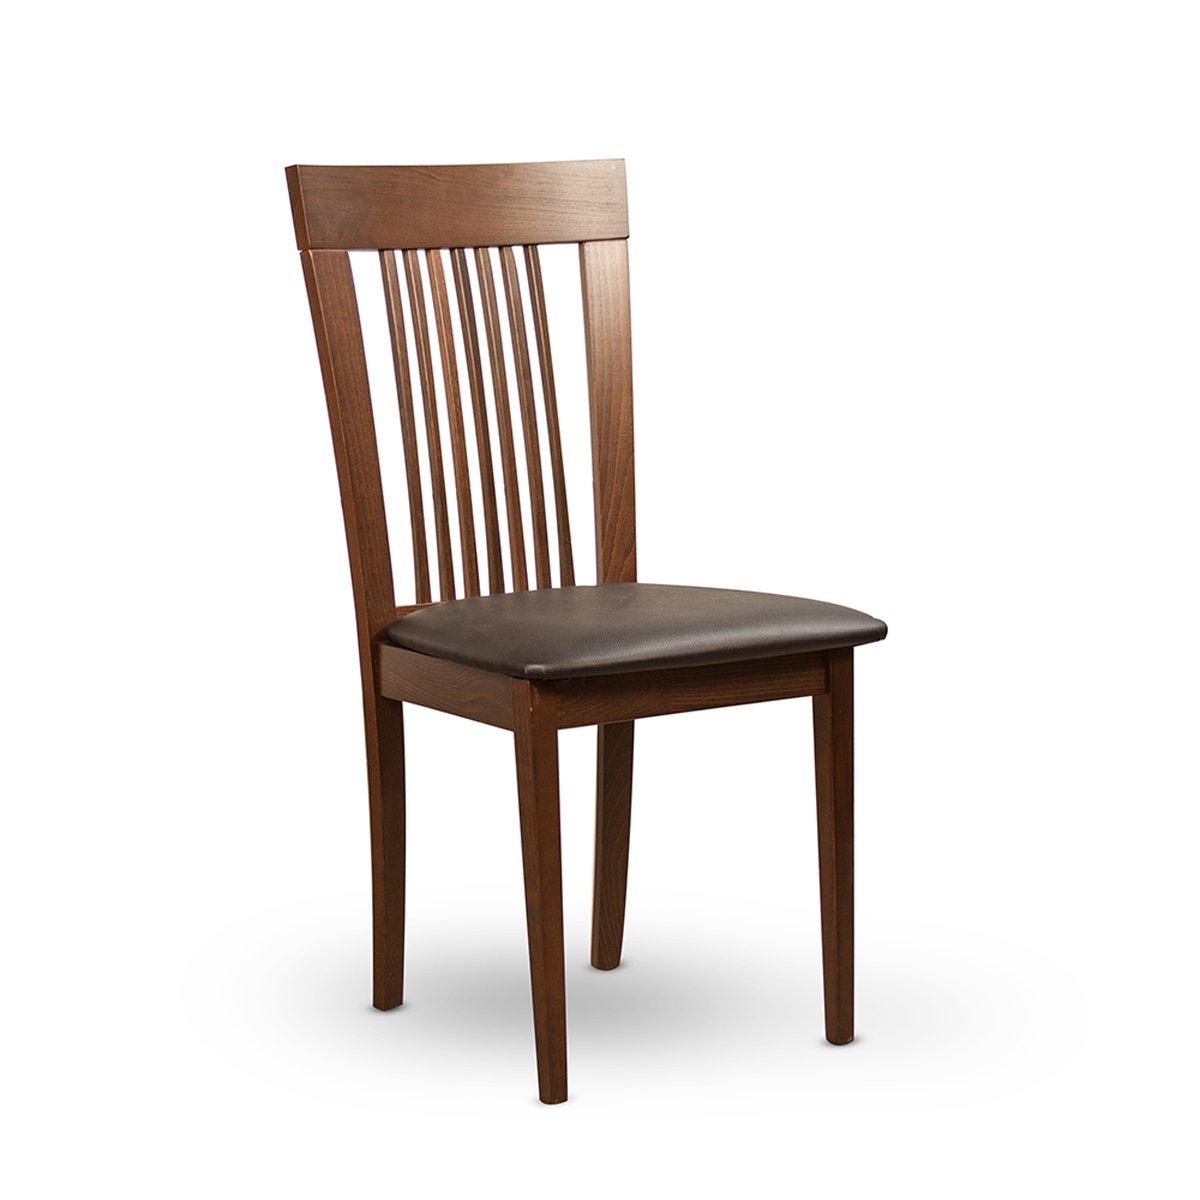 Comedor barcelona mesa 6 sillas sears com mx me entiende - Comedor barcelona ...